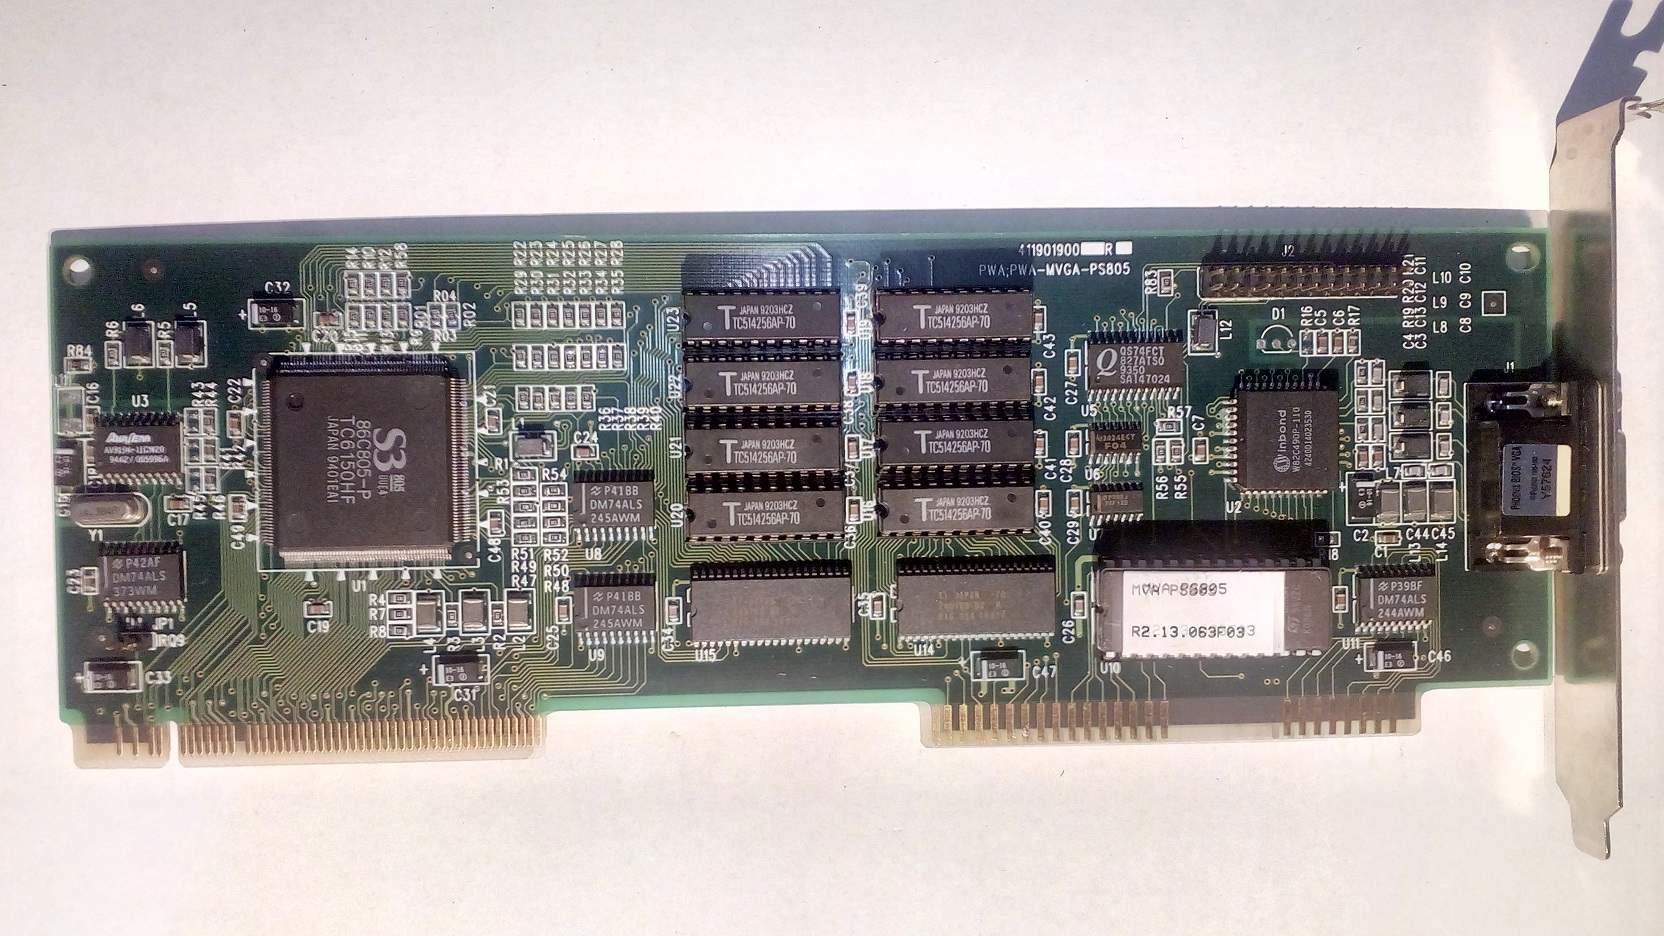 S3 805 VLB 2M